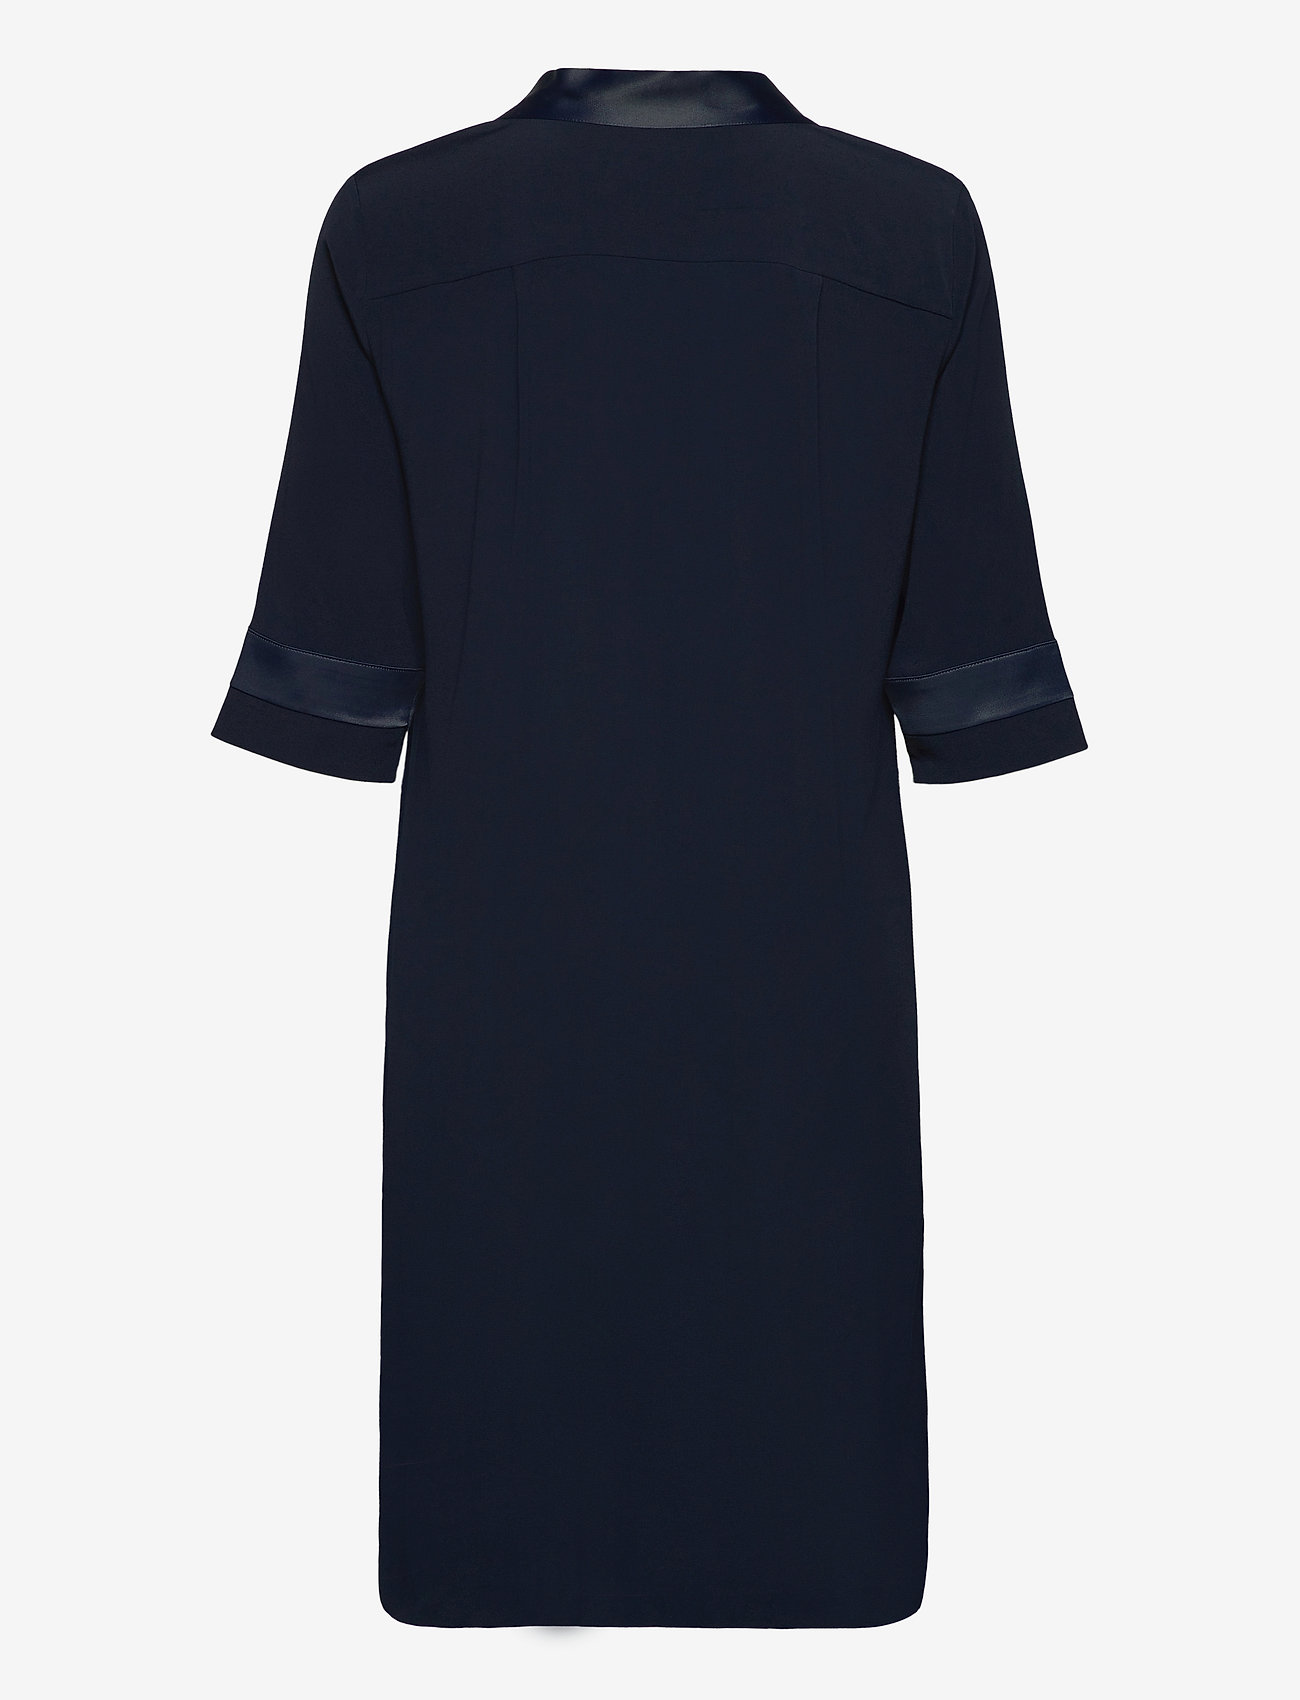 SAND - Crepe Satin Back - Ambar - robes de jour - medium blue - 1